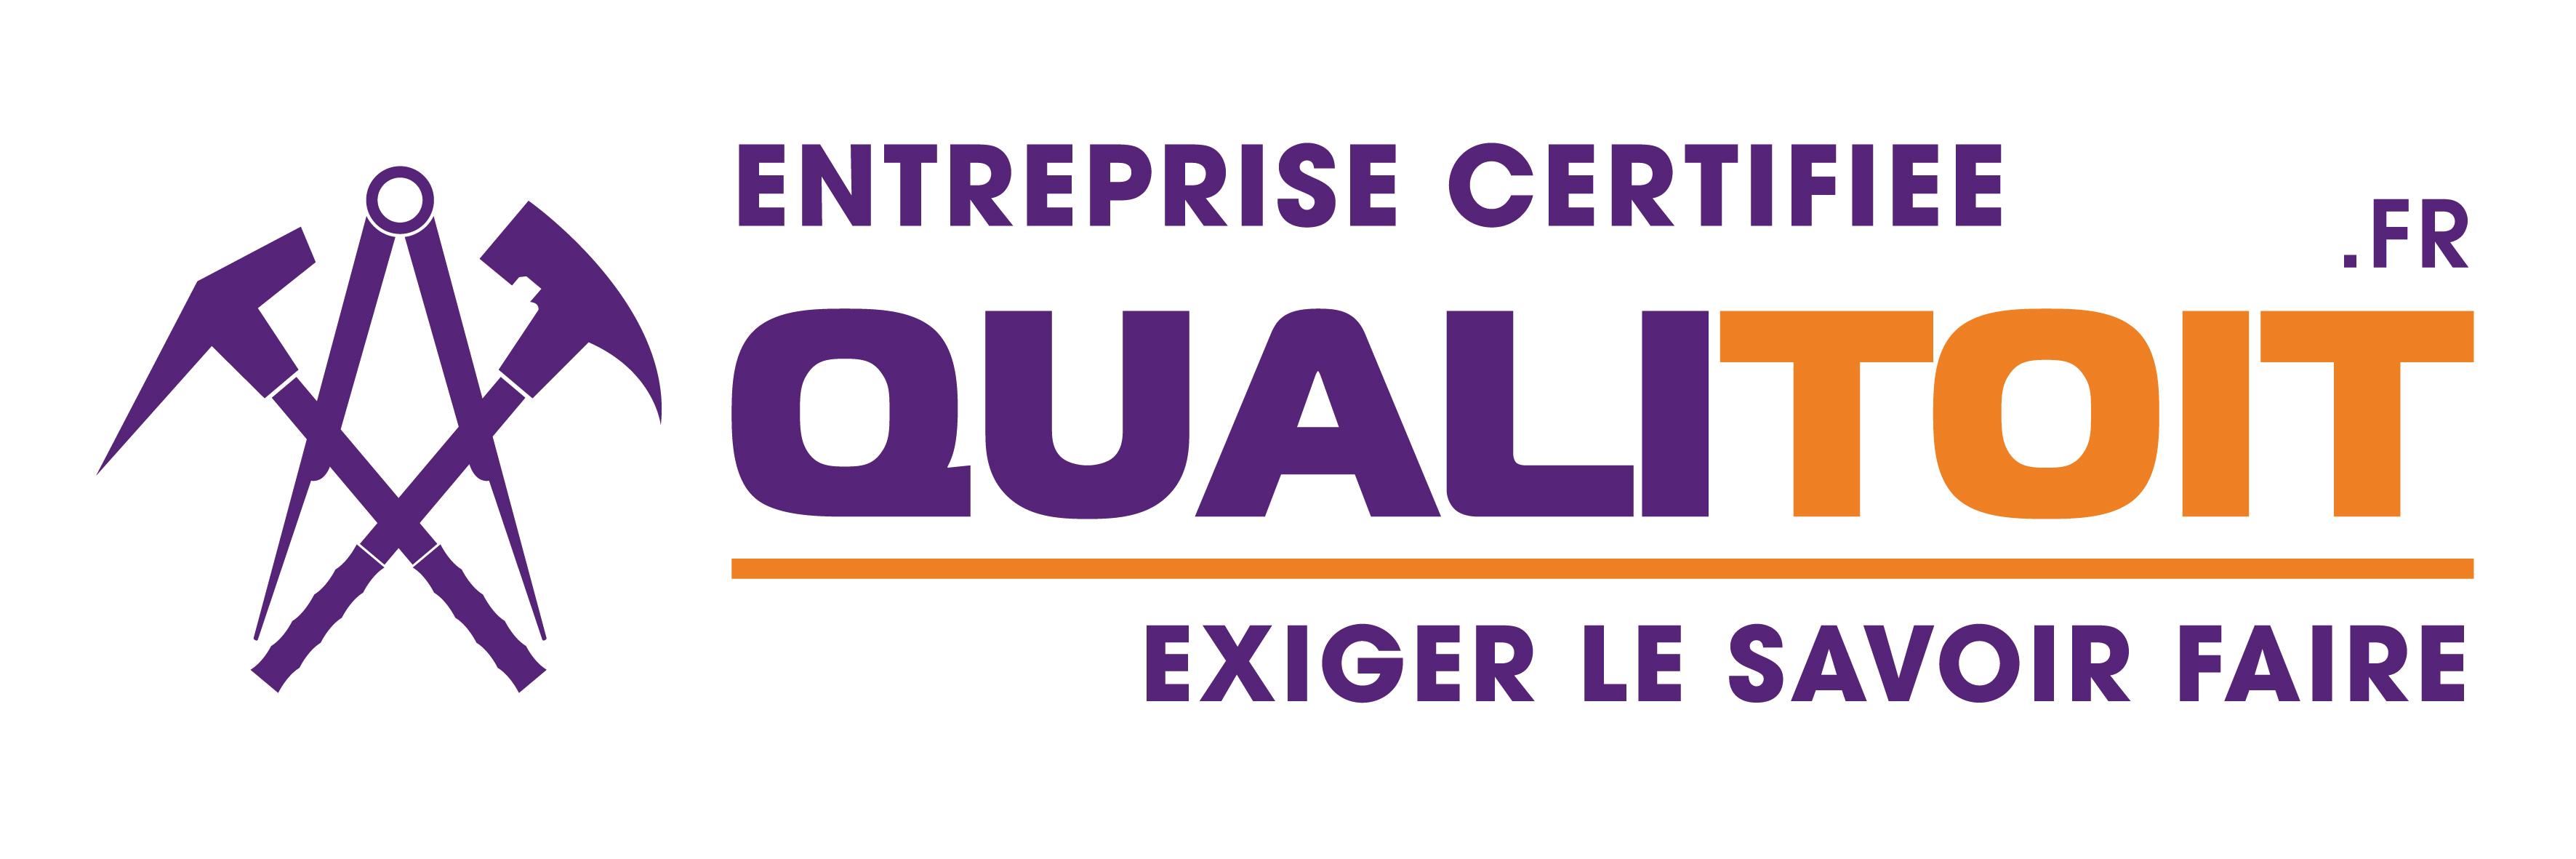 Logo Qualitoit 2018